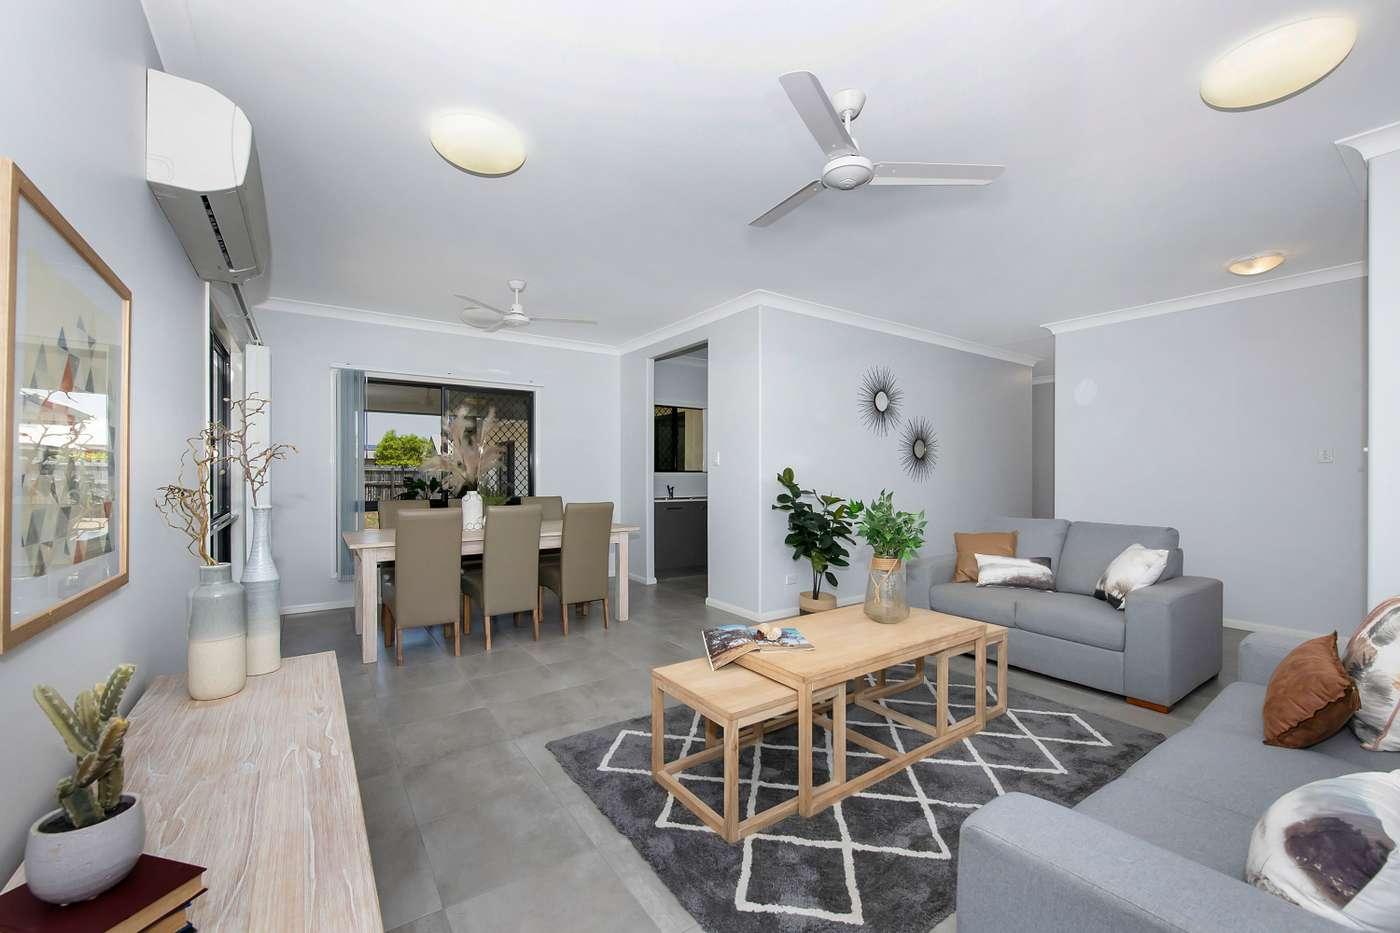 Main view of Homely house listing, 2 Springbrook Parade, Idalia, QLD 4811